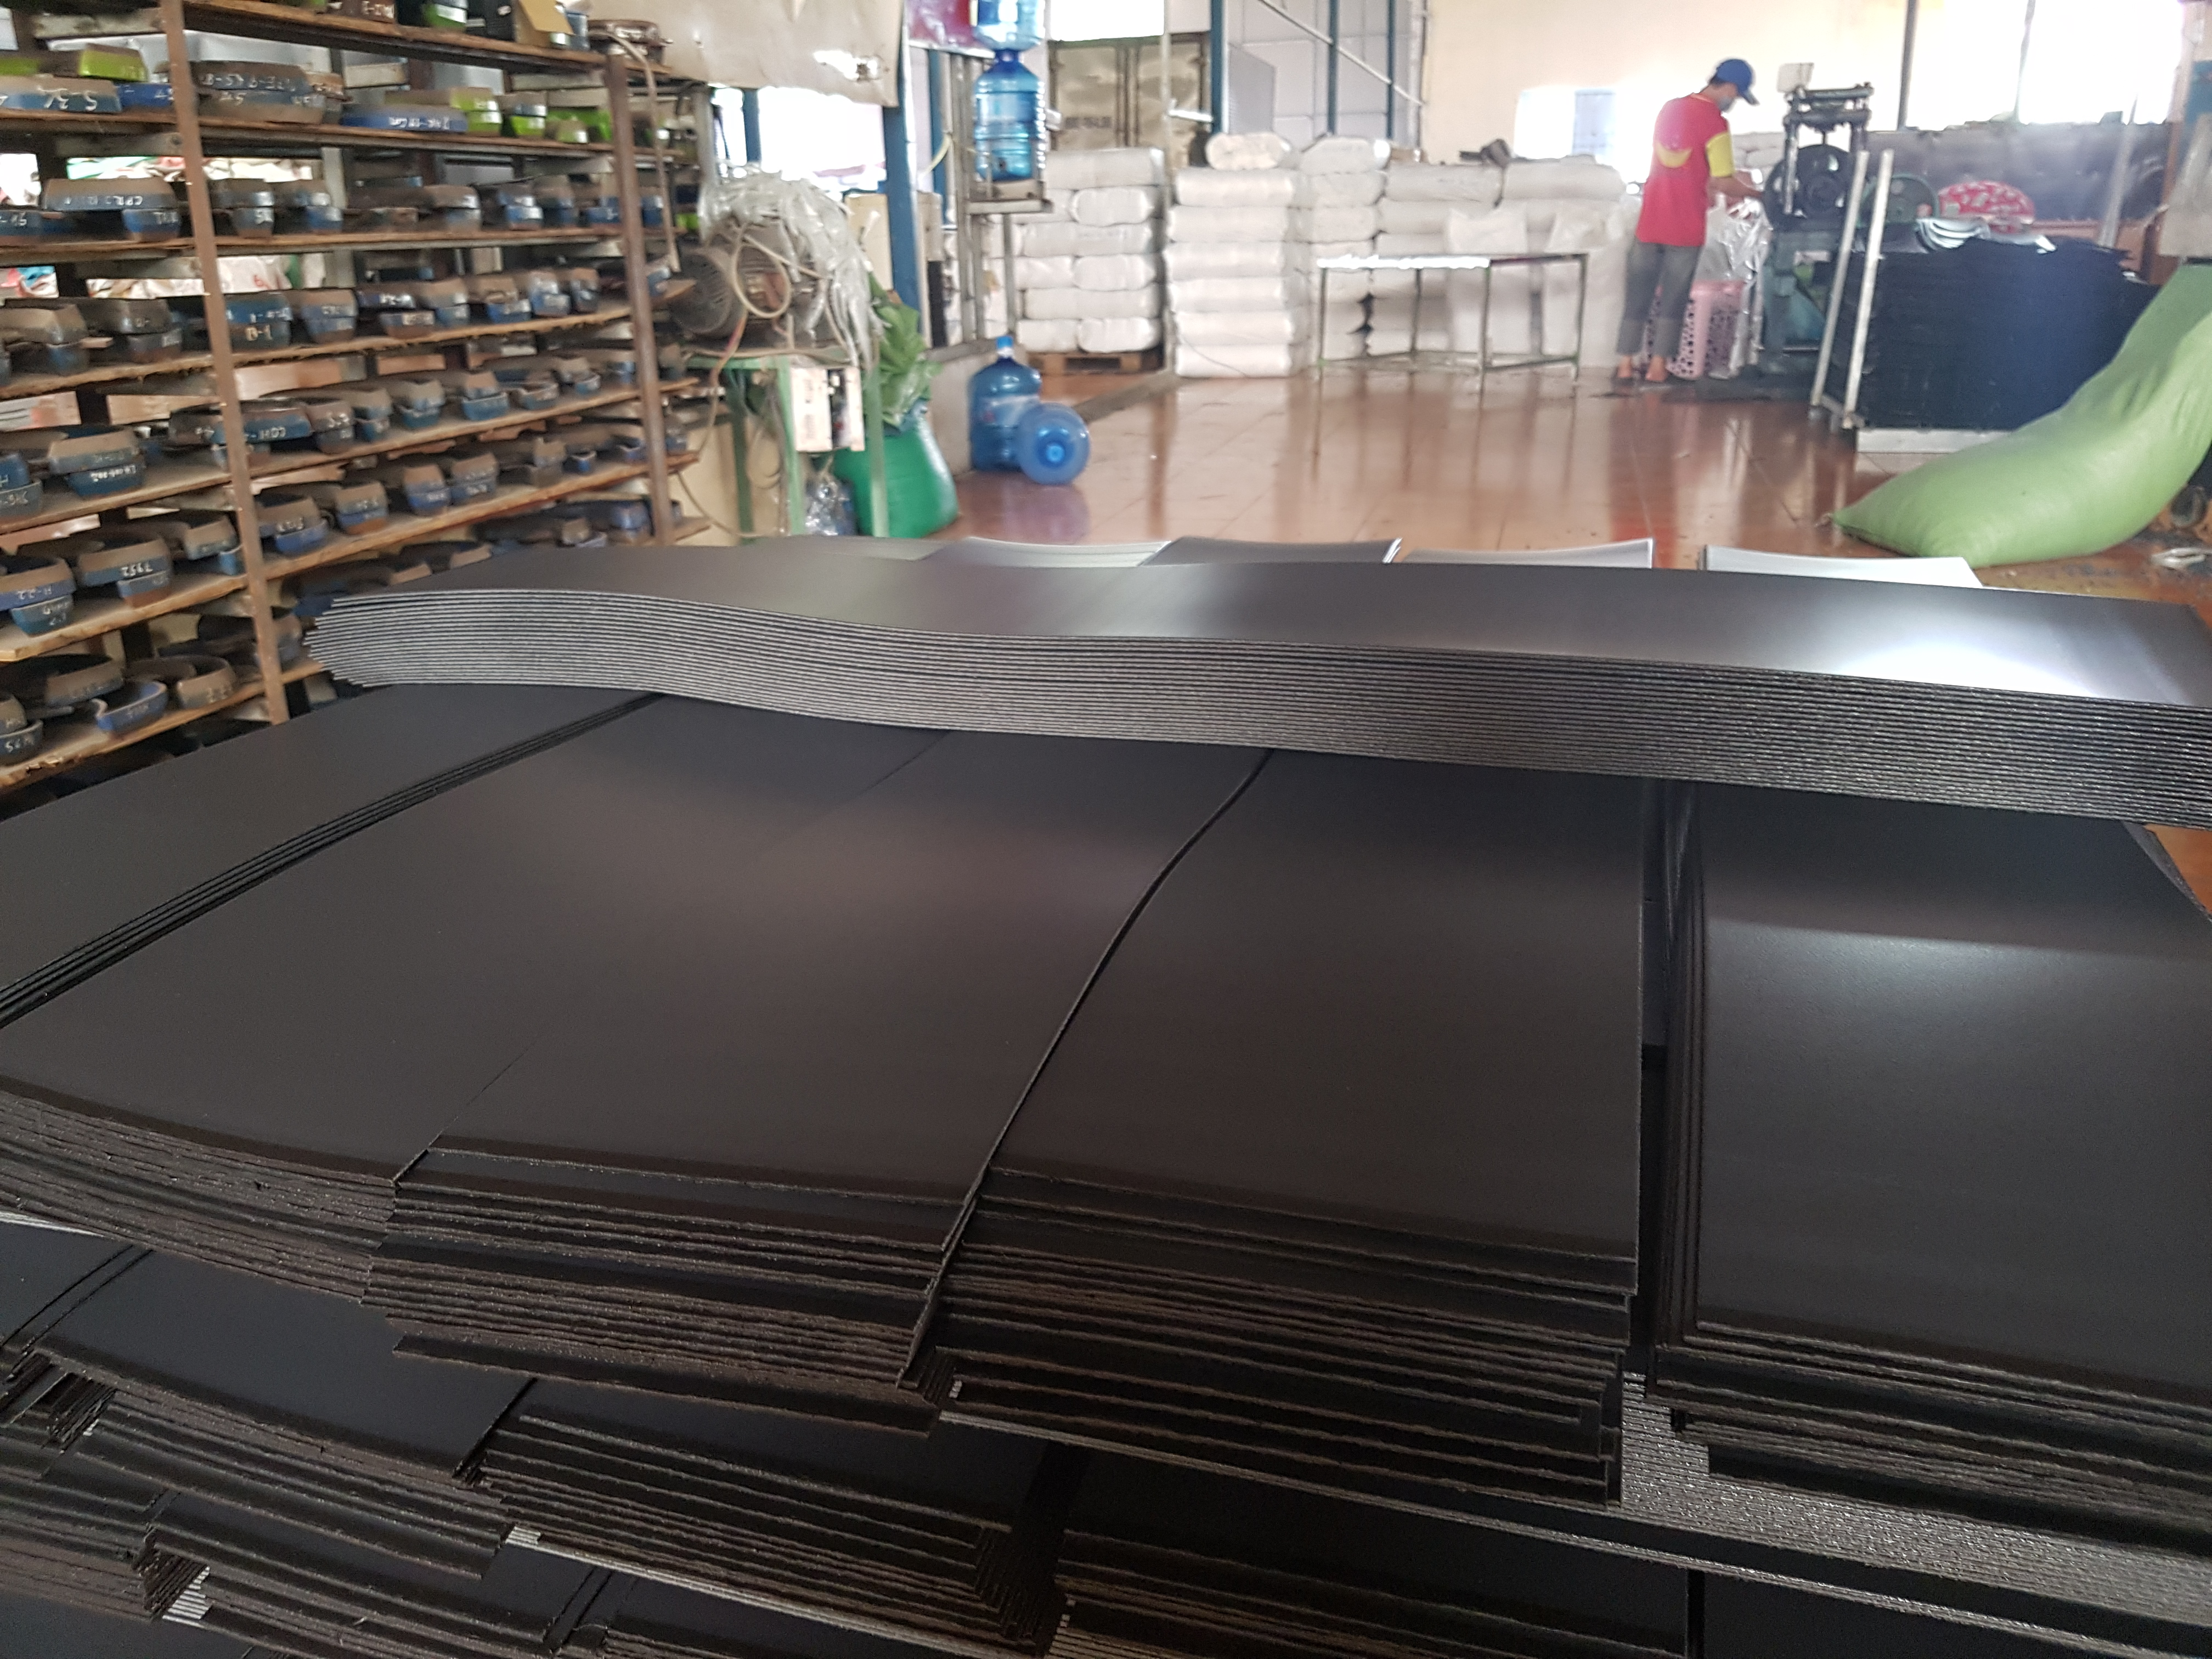 tấm nhựa đen sản xuất vali